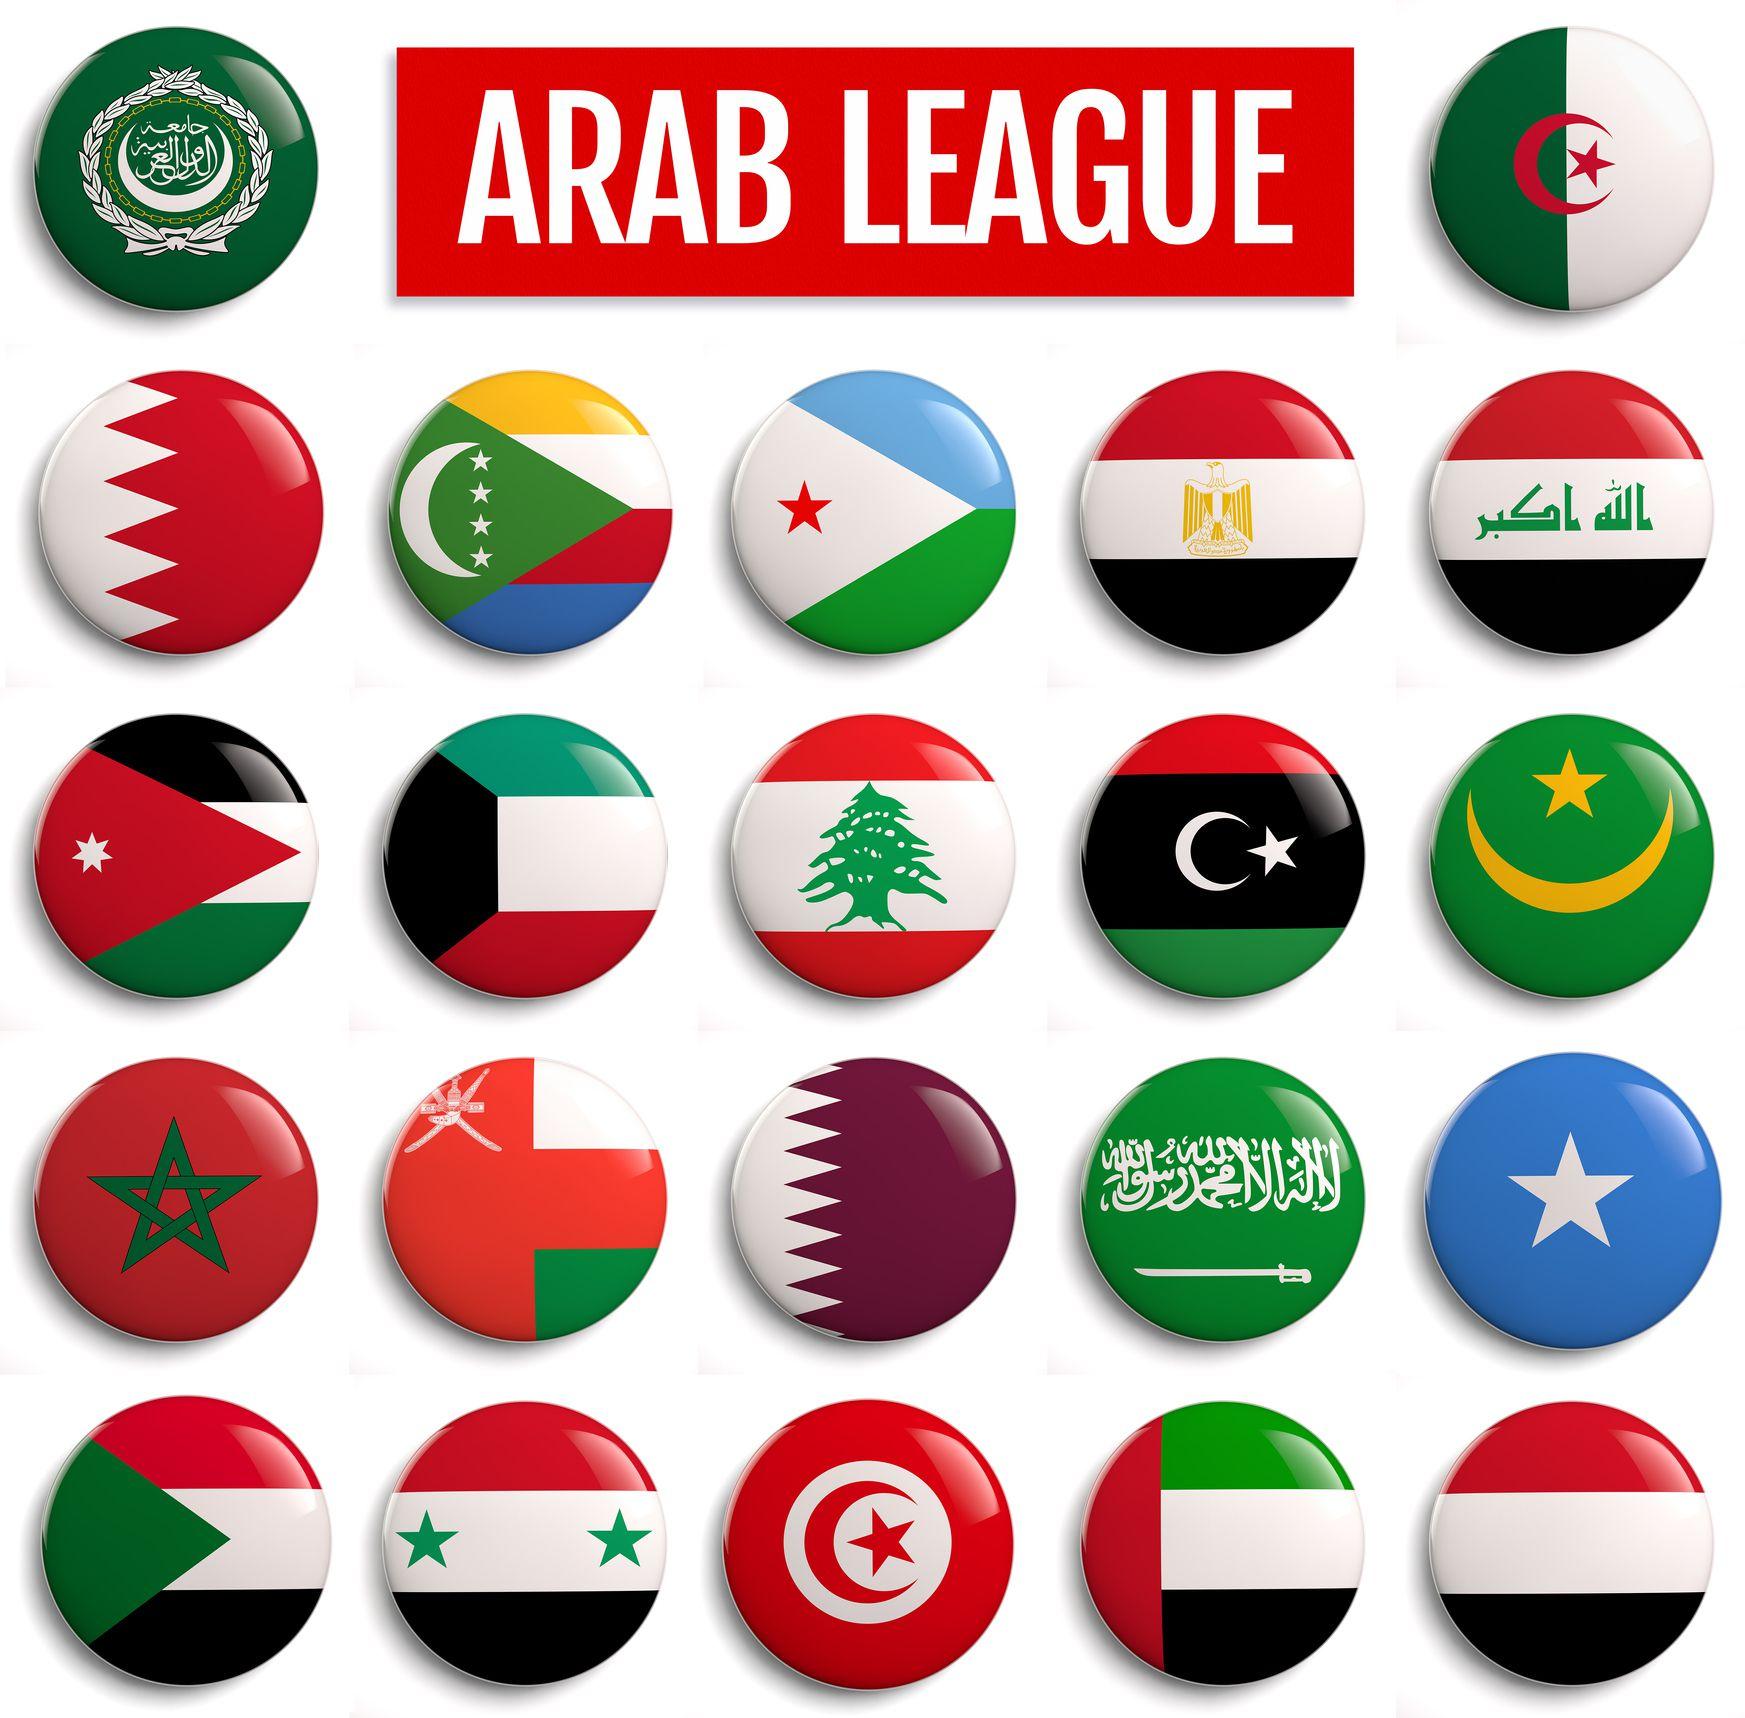 Arab League Definition